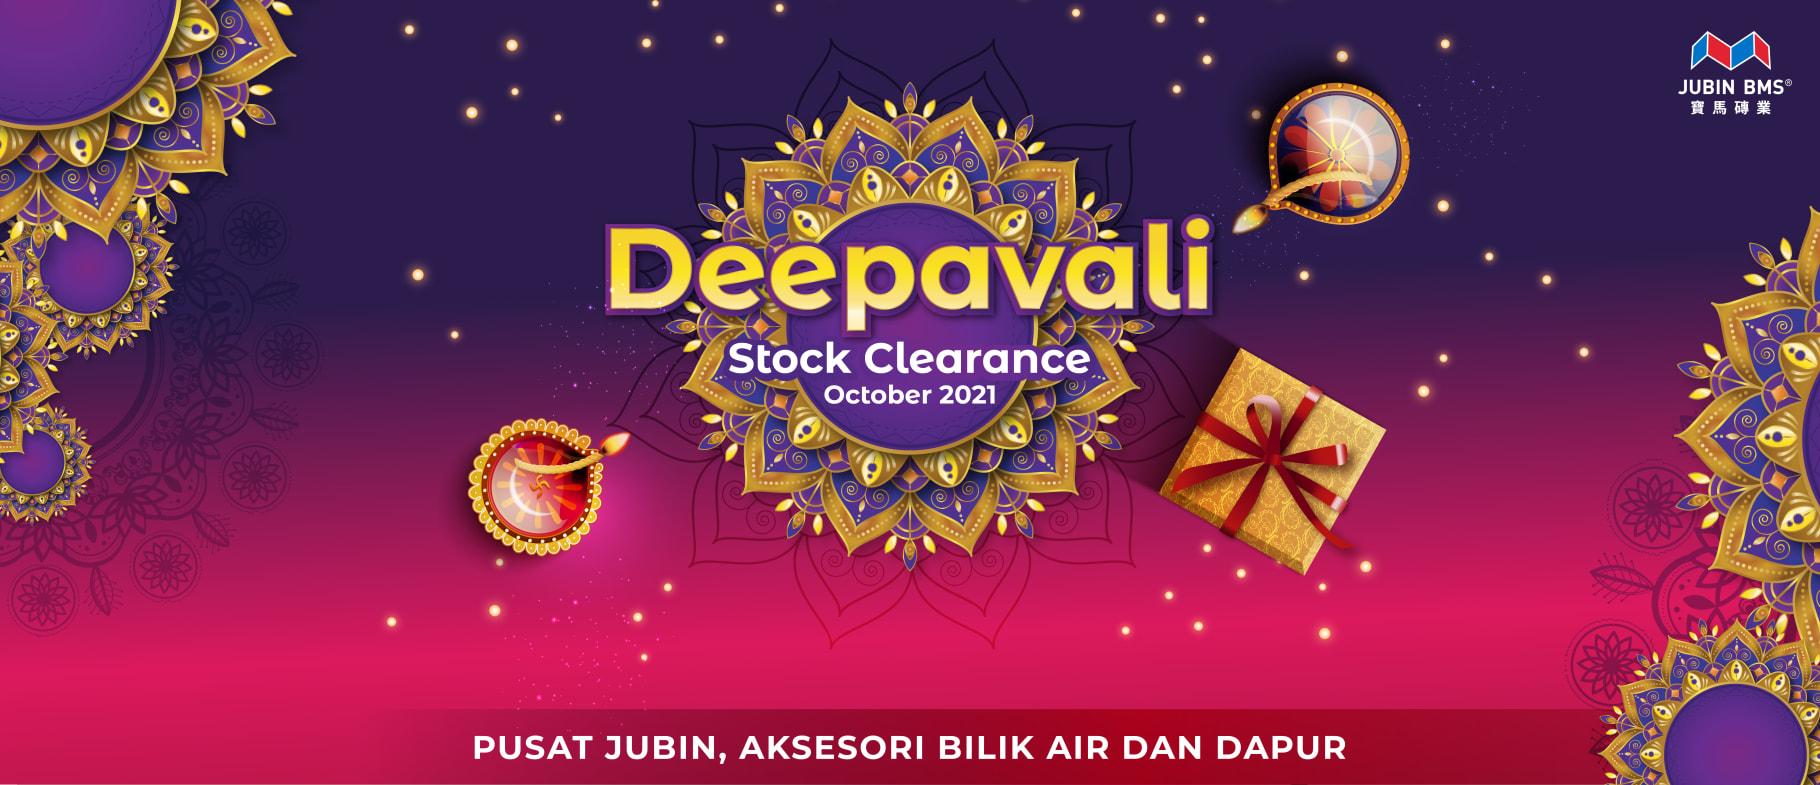 Deepavali Stock Clearance